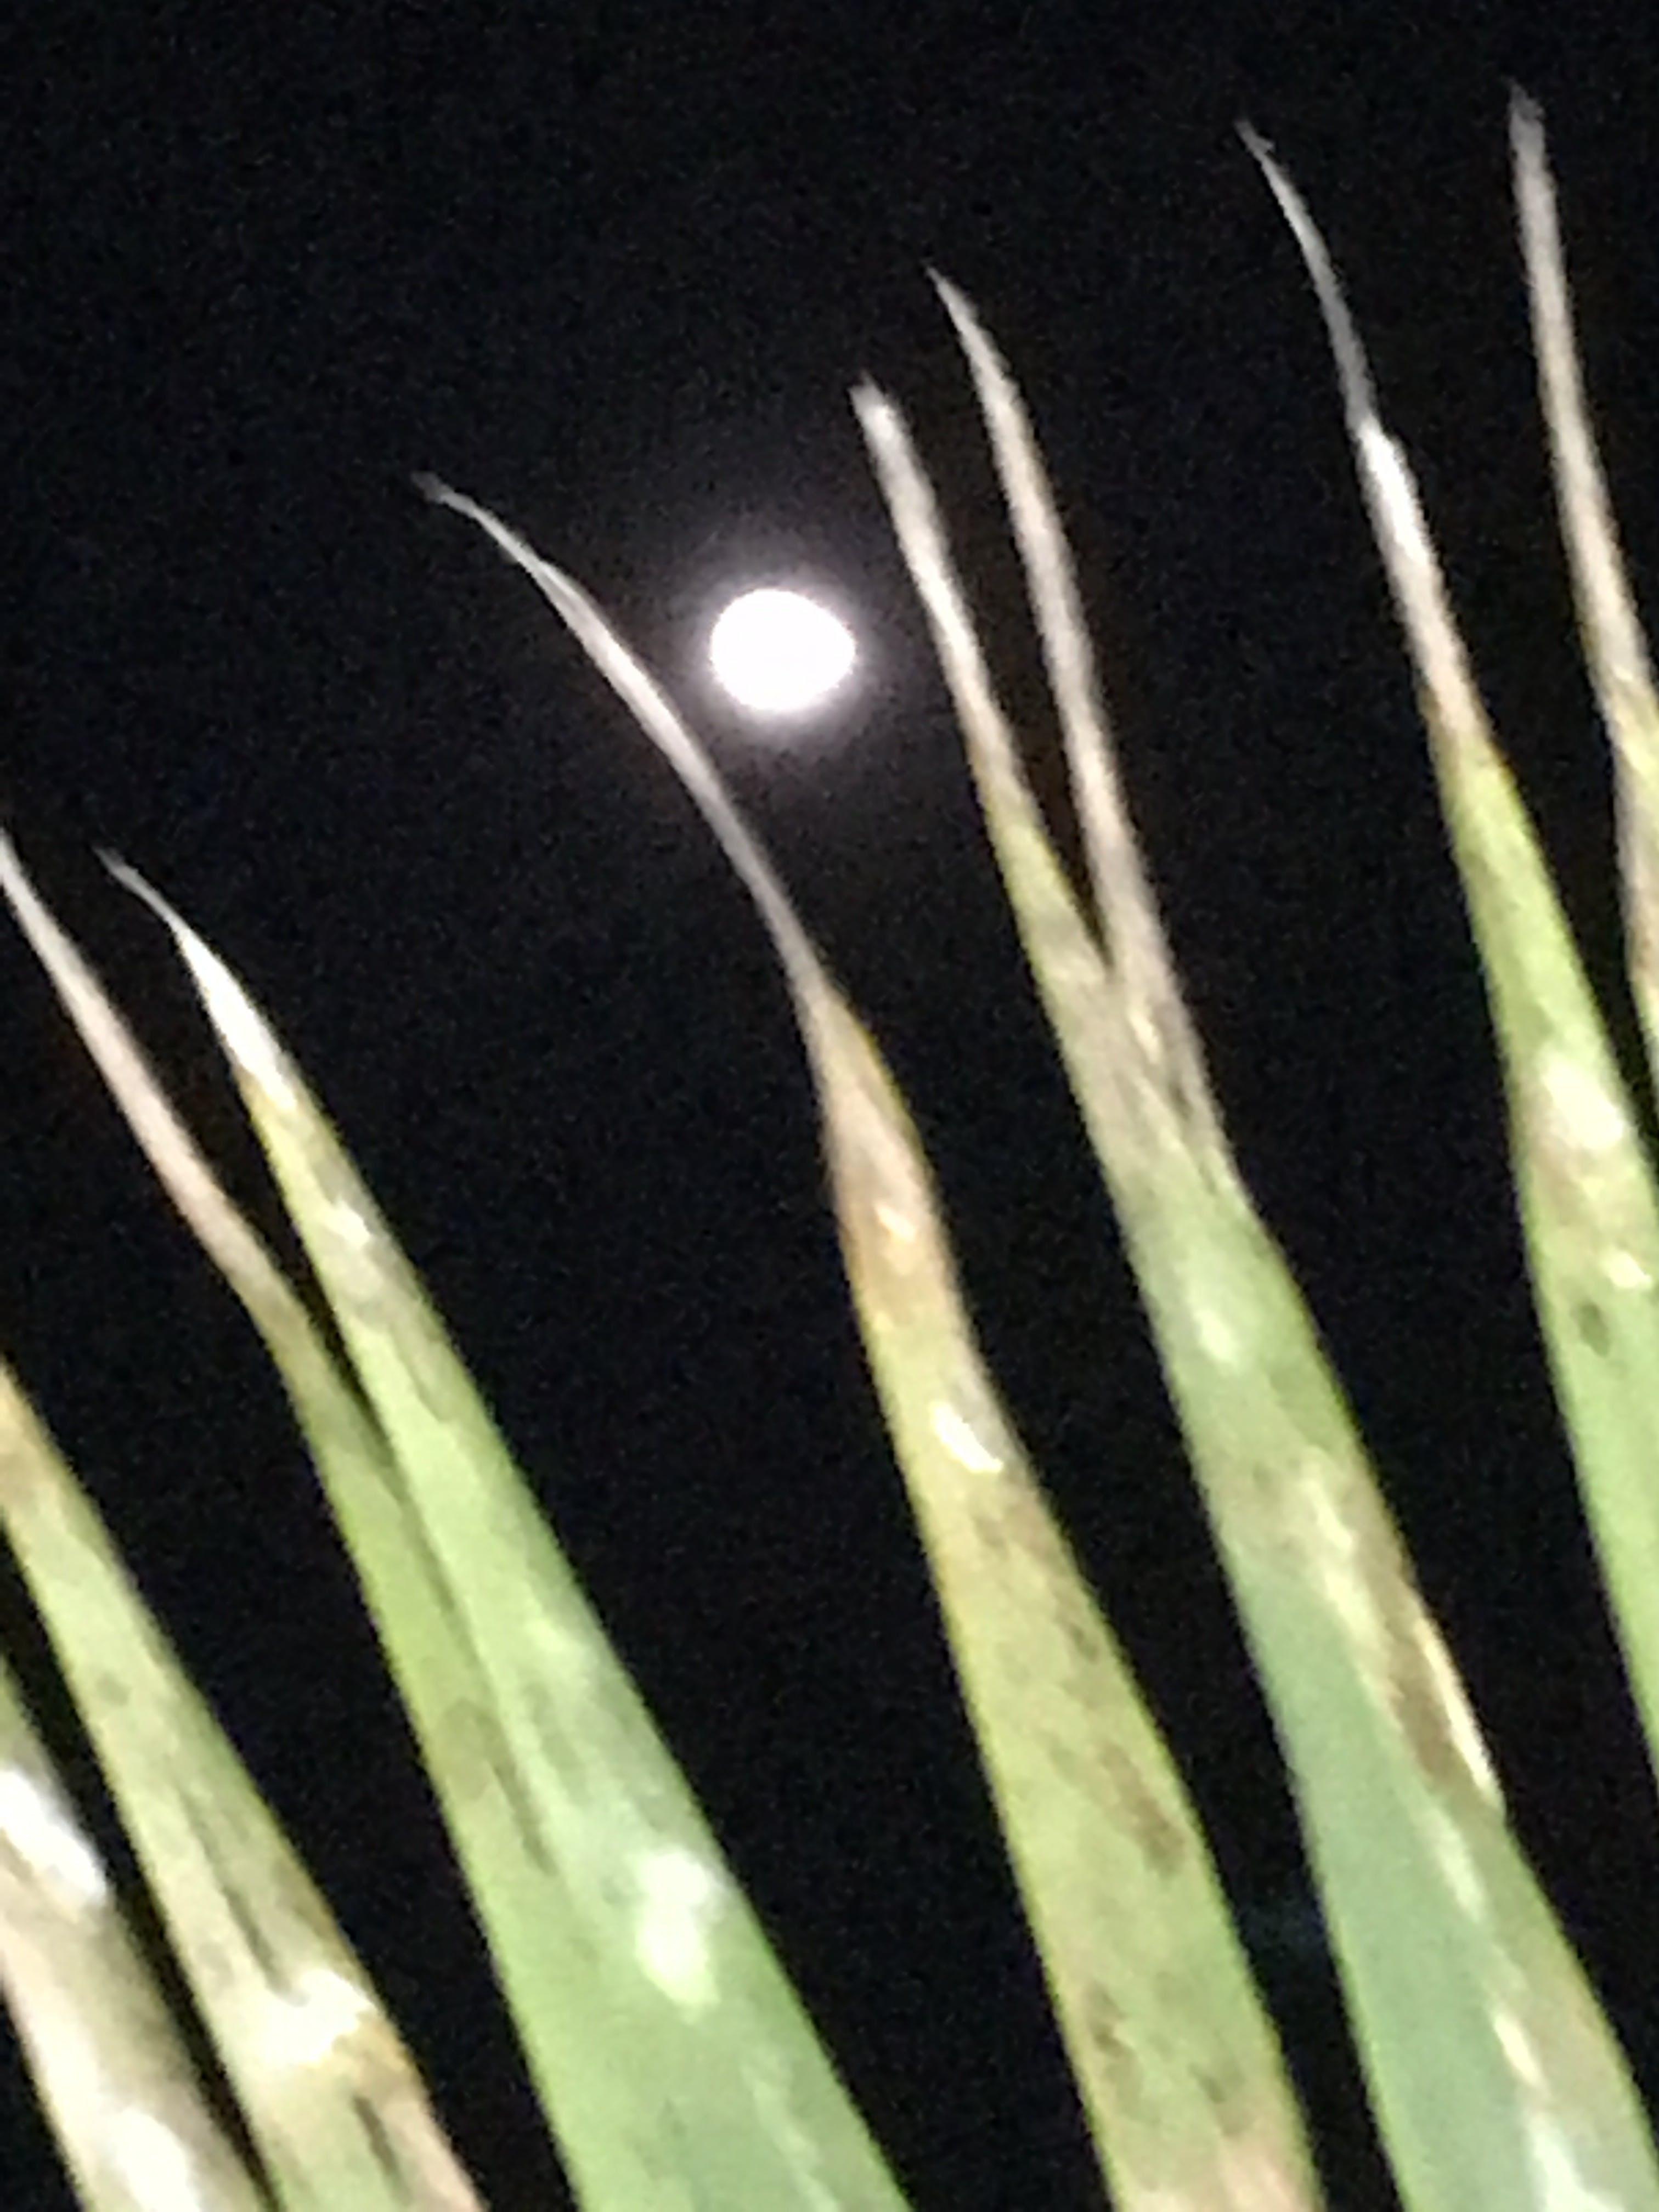 Free stock photo of night, palm trees